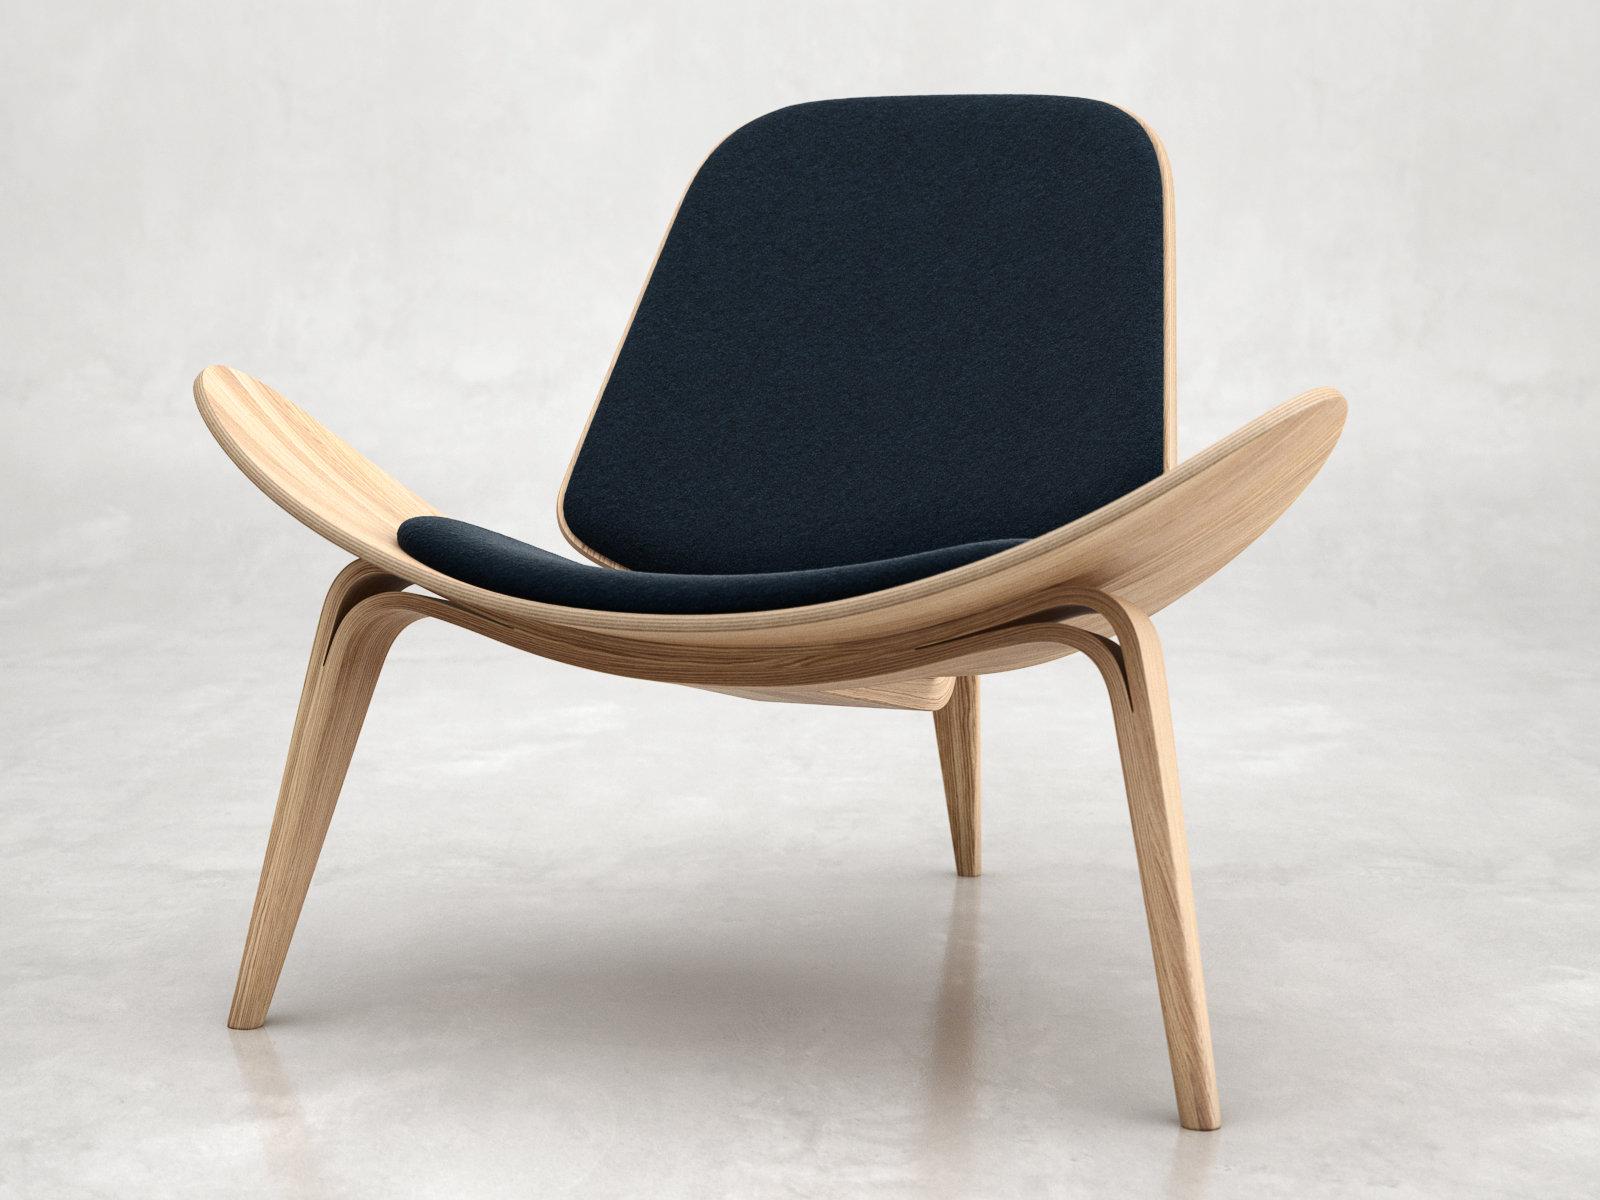 chair design model posture and ottoman set white ch07 shell 3d carl hansen